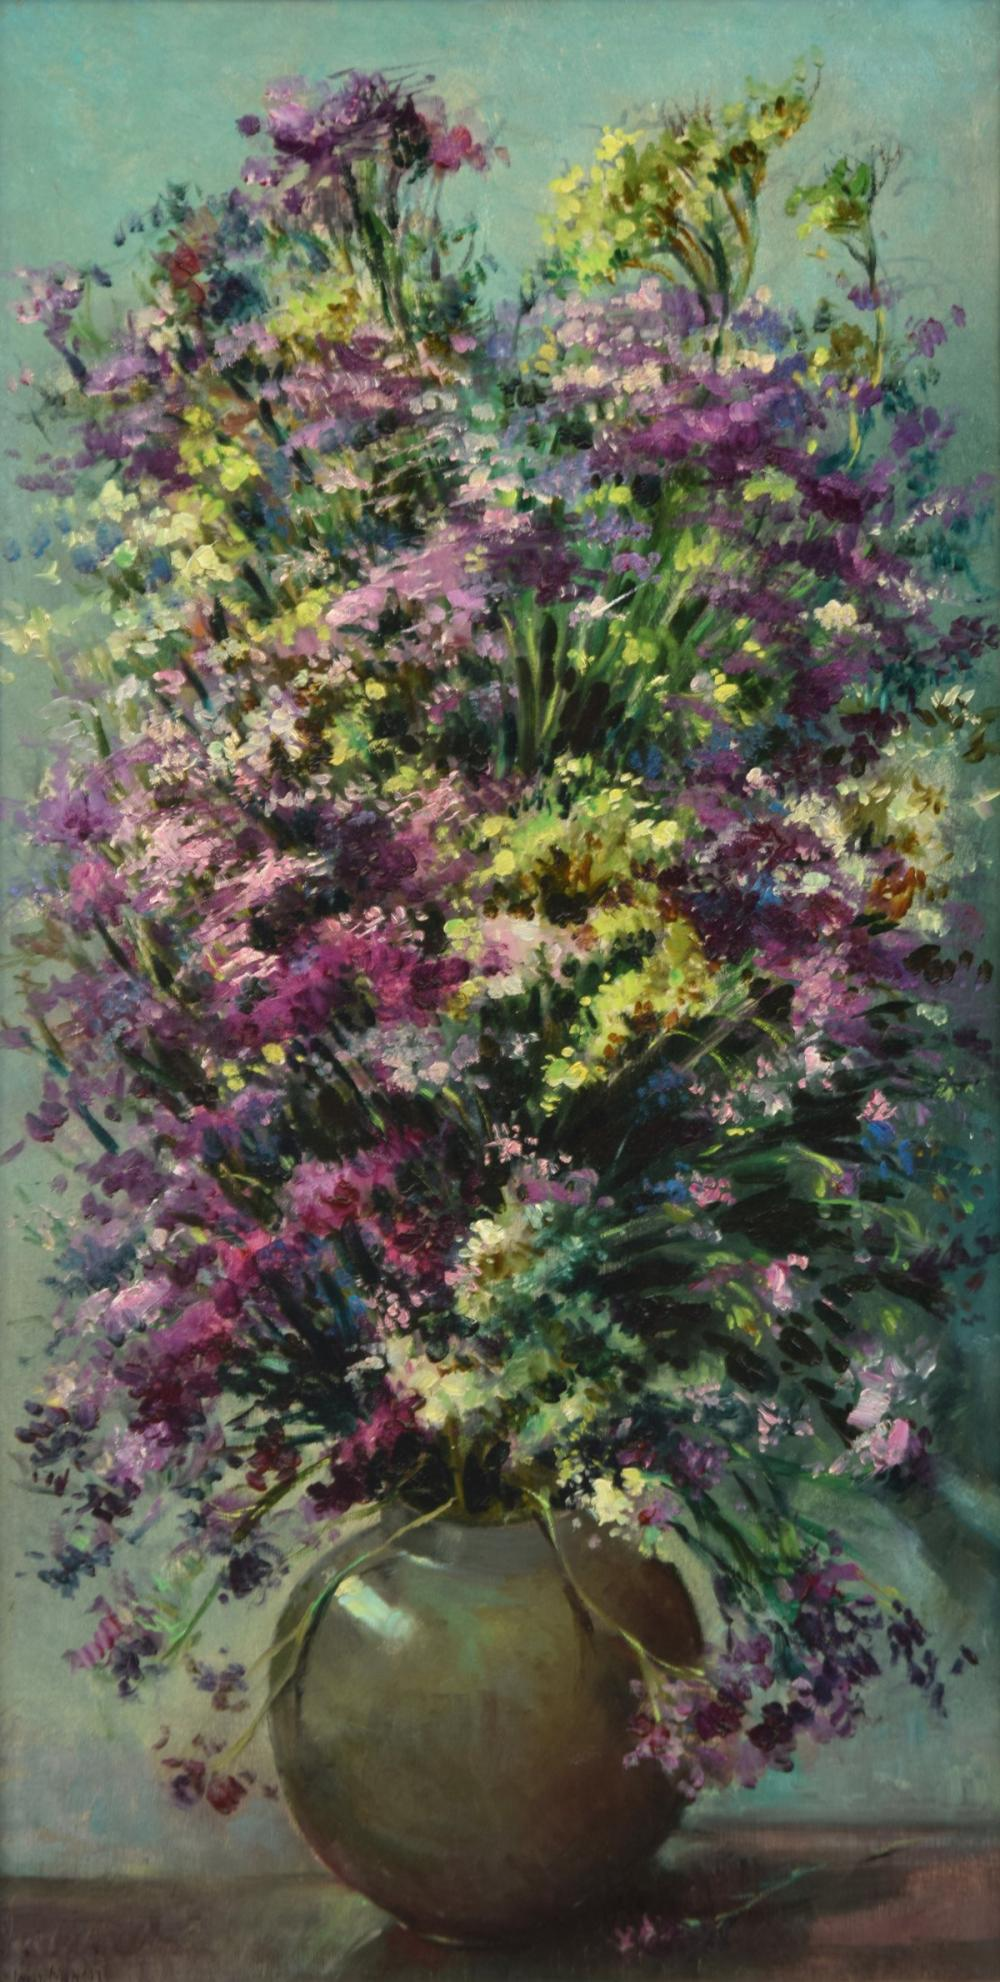 Luis Alfredo Lopez Mendez Floral Still Life Painting